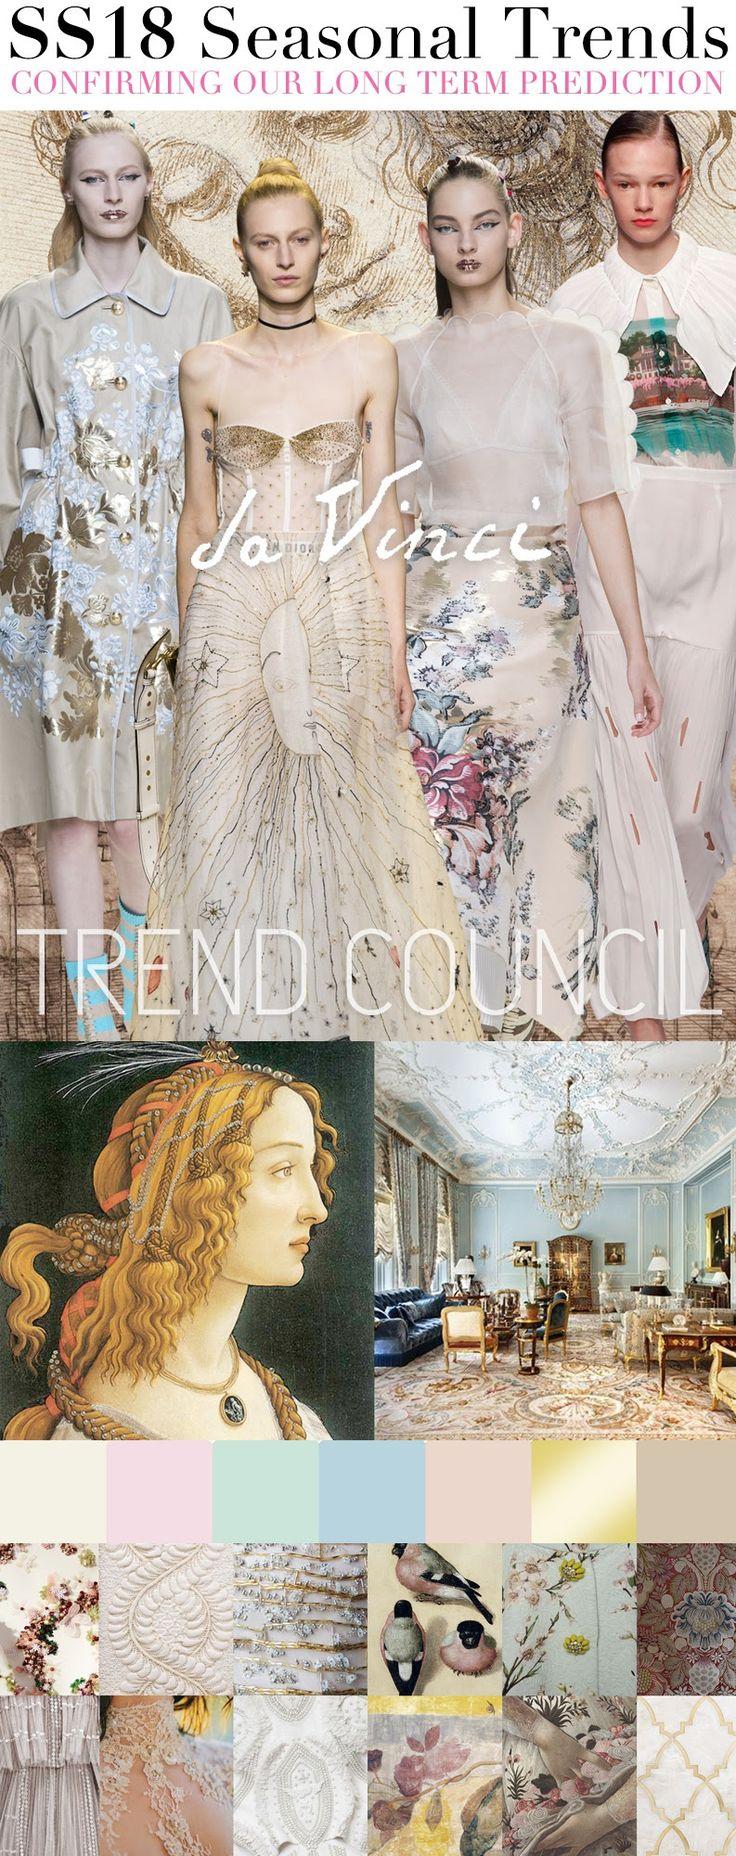 TENDENCIA - Inspirado en Leonardo Da Vinci - Da Vinci TREND SS18 via TrendCouncil #coolhunting #tendencias